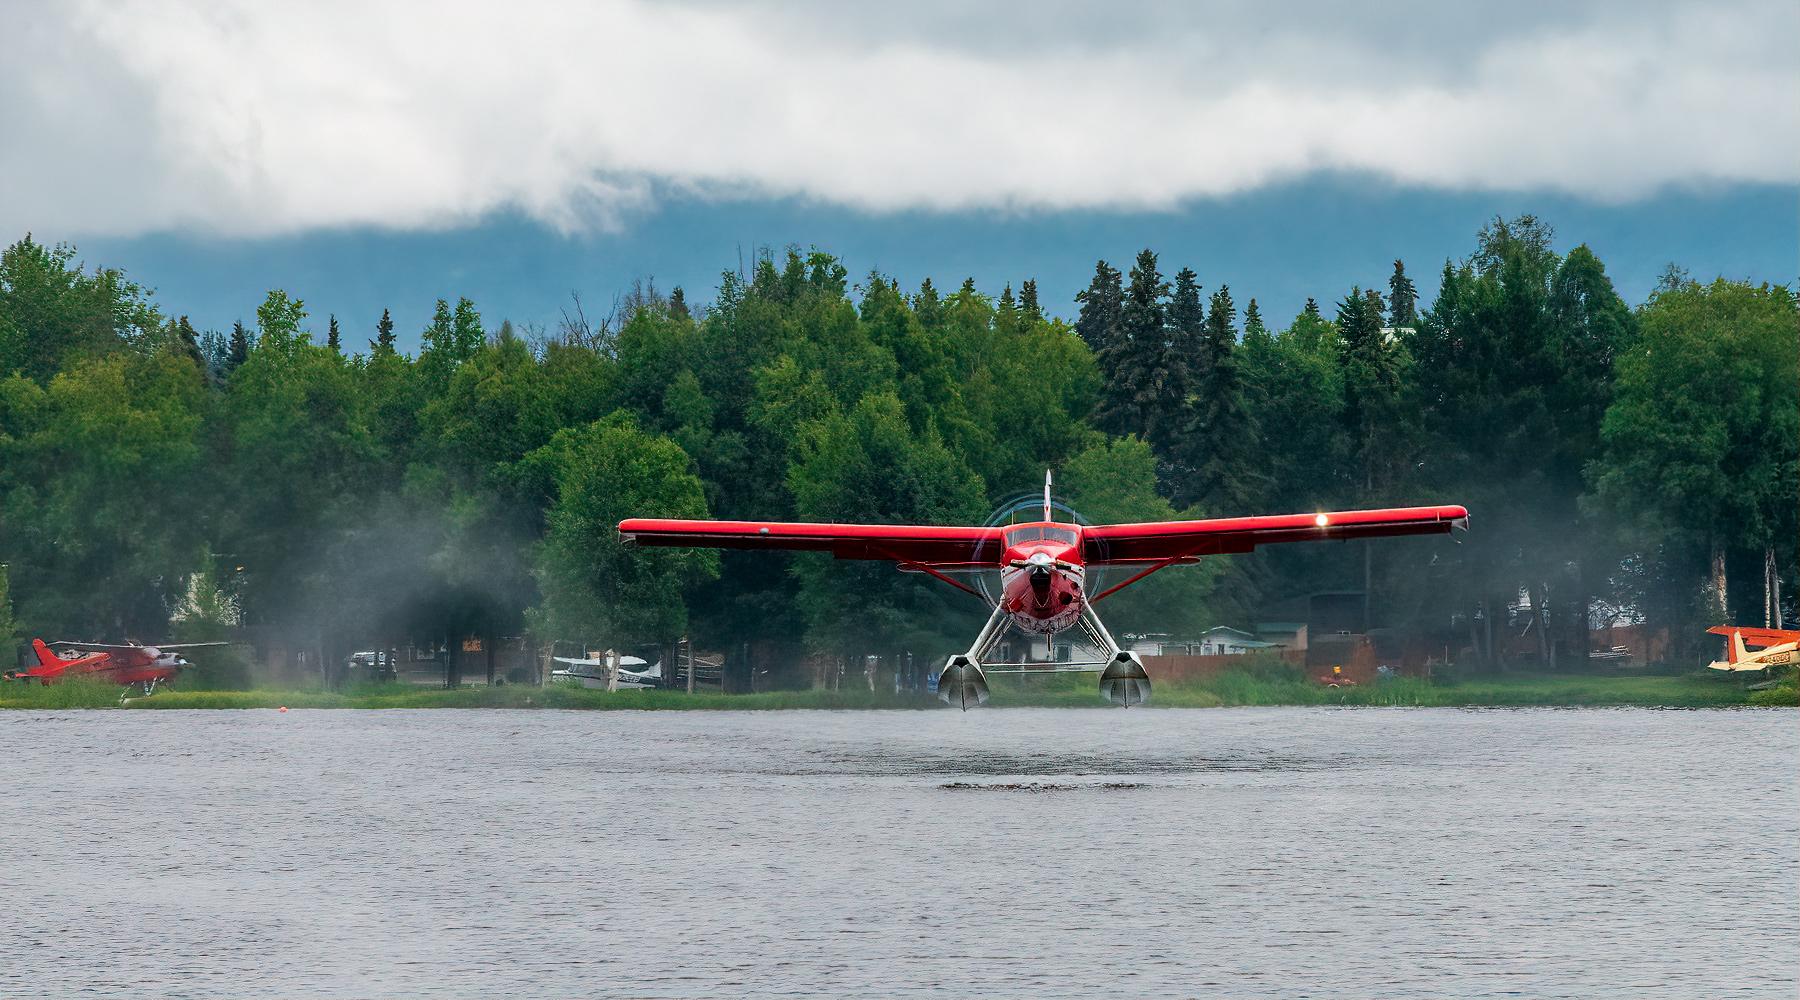 Red Alaskan sea plane takes off